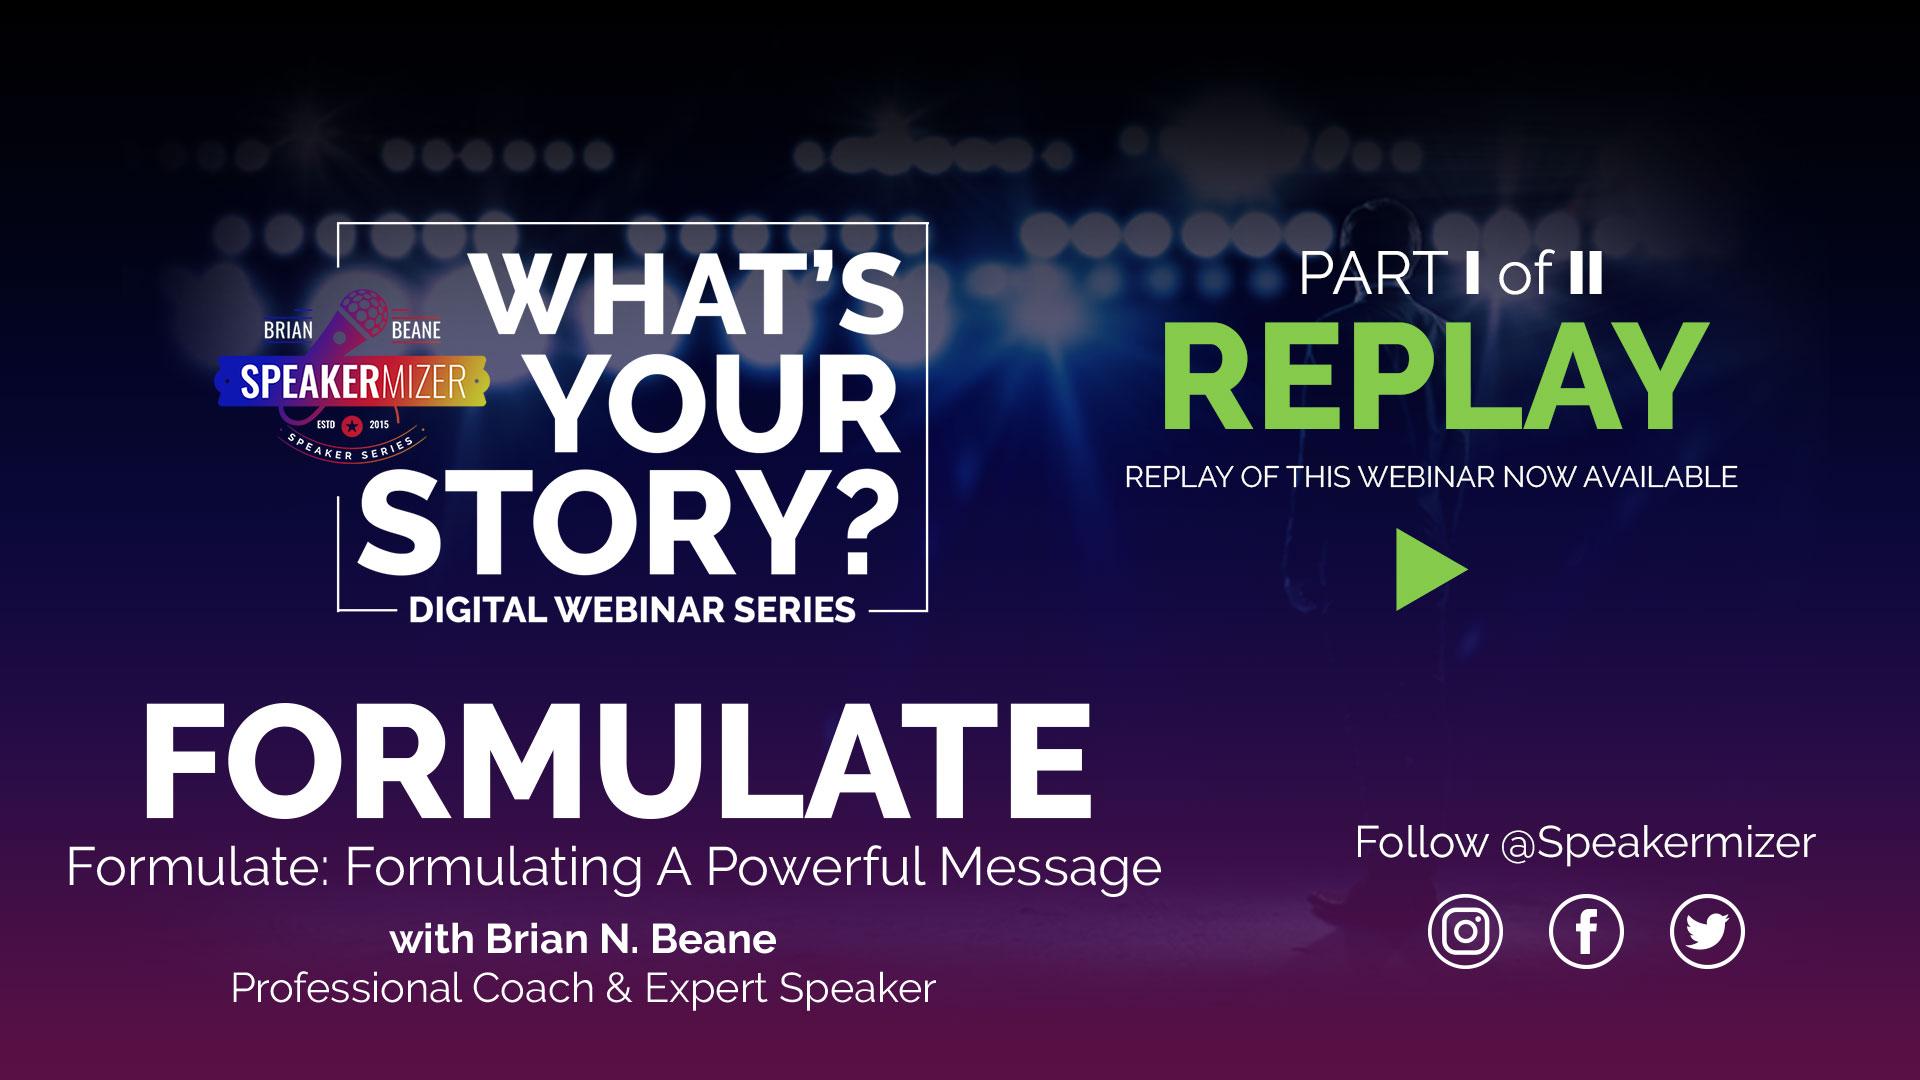 https://speakermizer.com/wp-content/uploads/2019/03/ReplayPart1-Formulate-VideoReplay.jpg